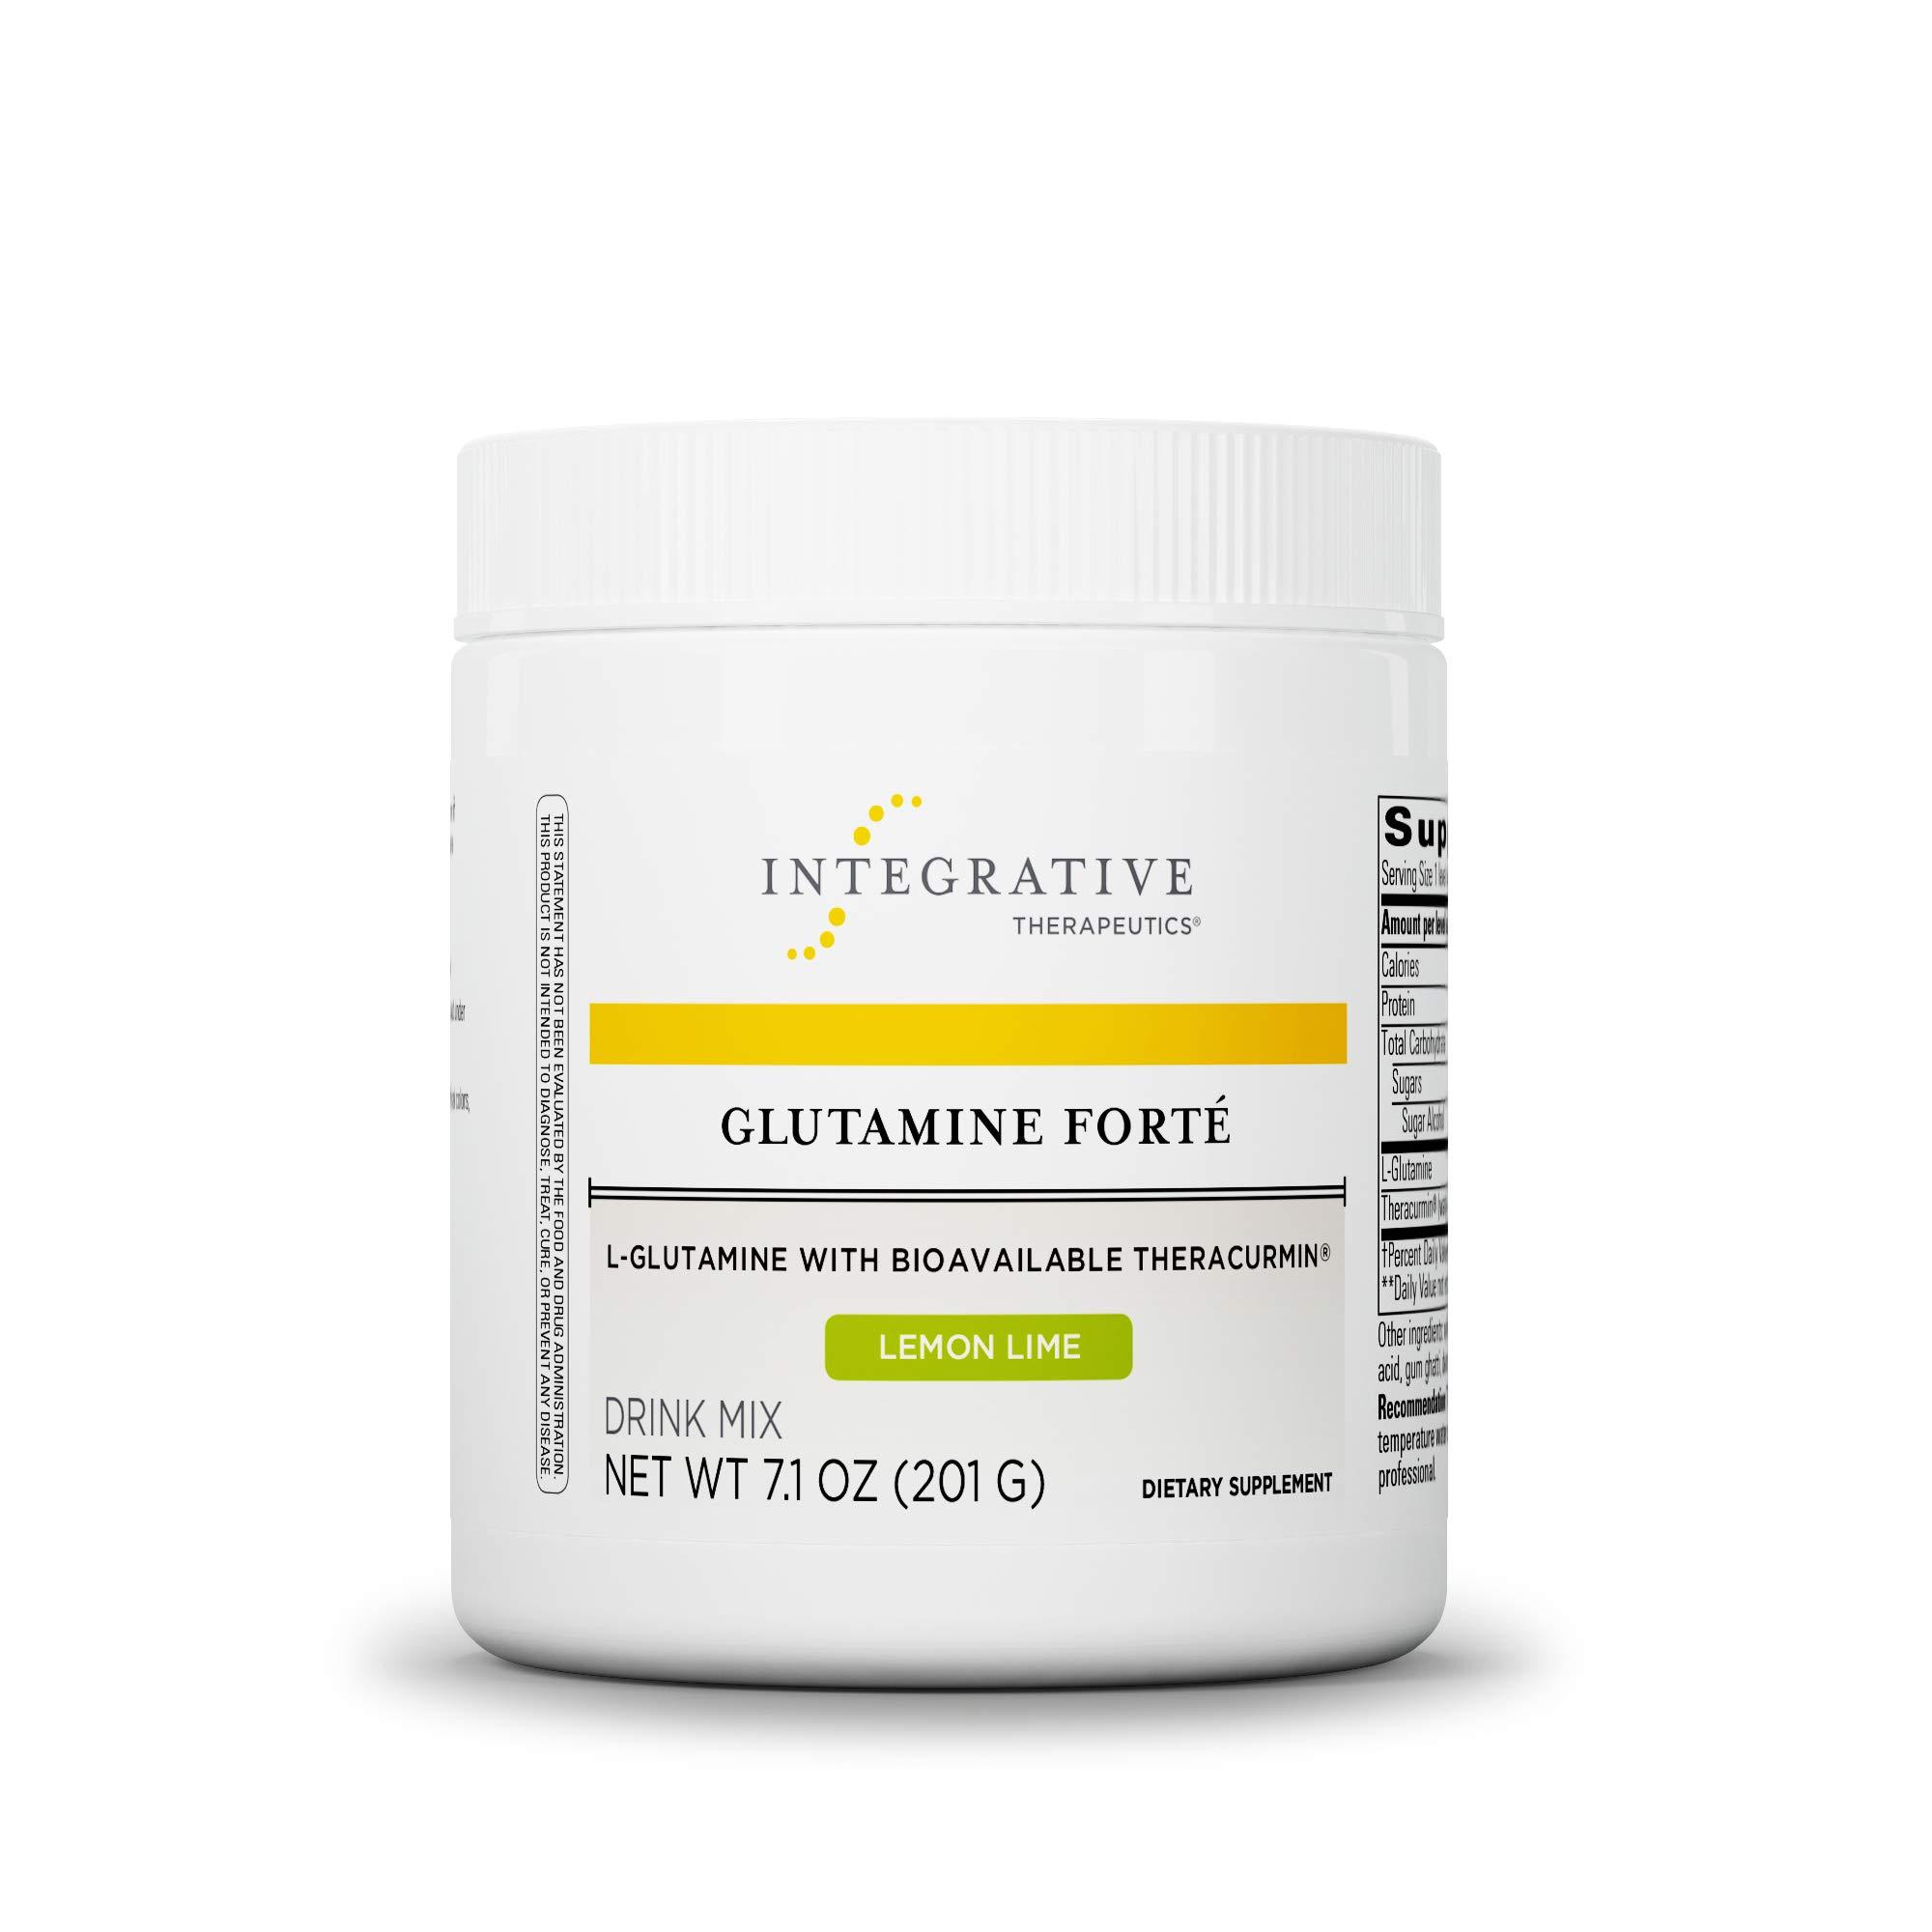 Integrative Therapeutics - Glutamine Forté - L-Glutamine with Bioavailable Theracurmin - Lemon Lime Flavor - 7.1 oz by Integrative Therapeutics